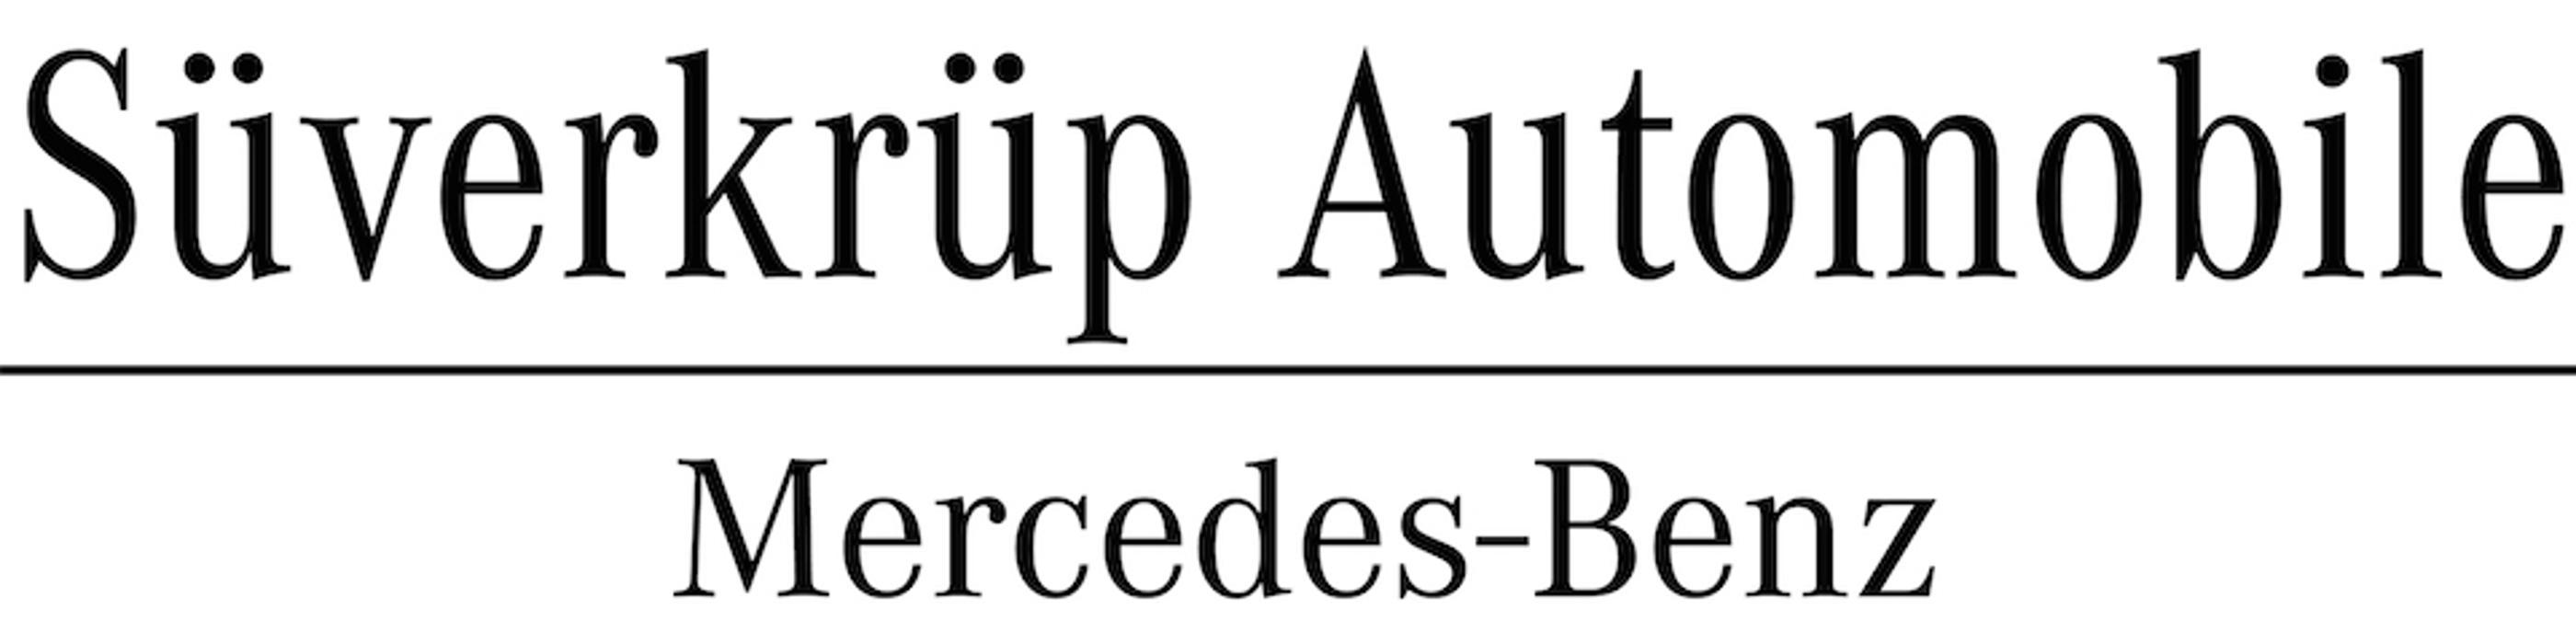 Logo von Mercedes-Benz Süverkrüp Automobile - Kiel